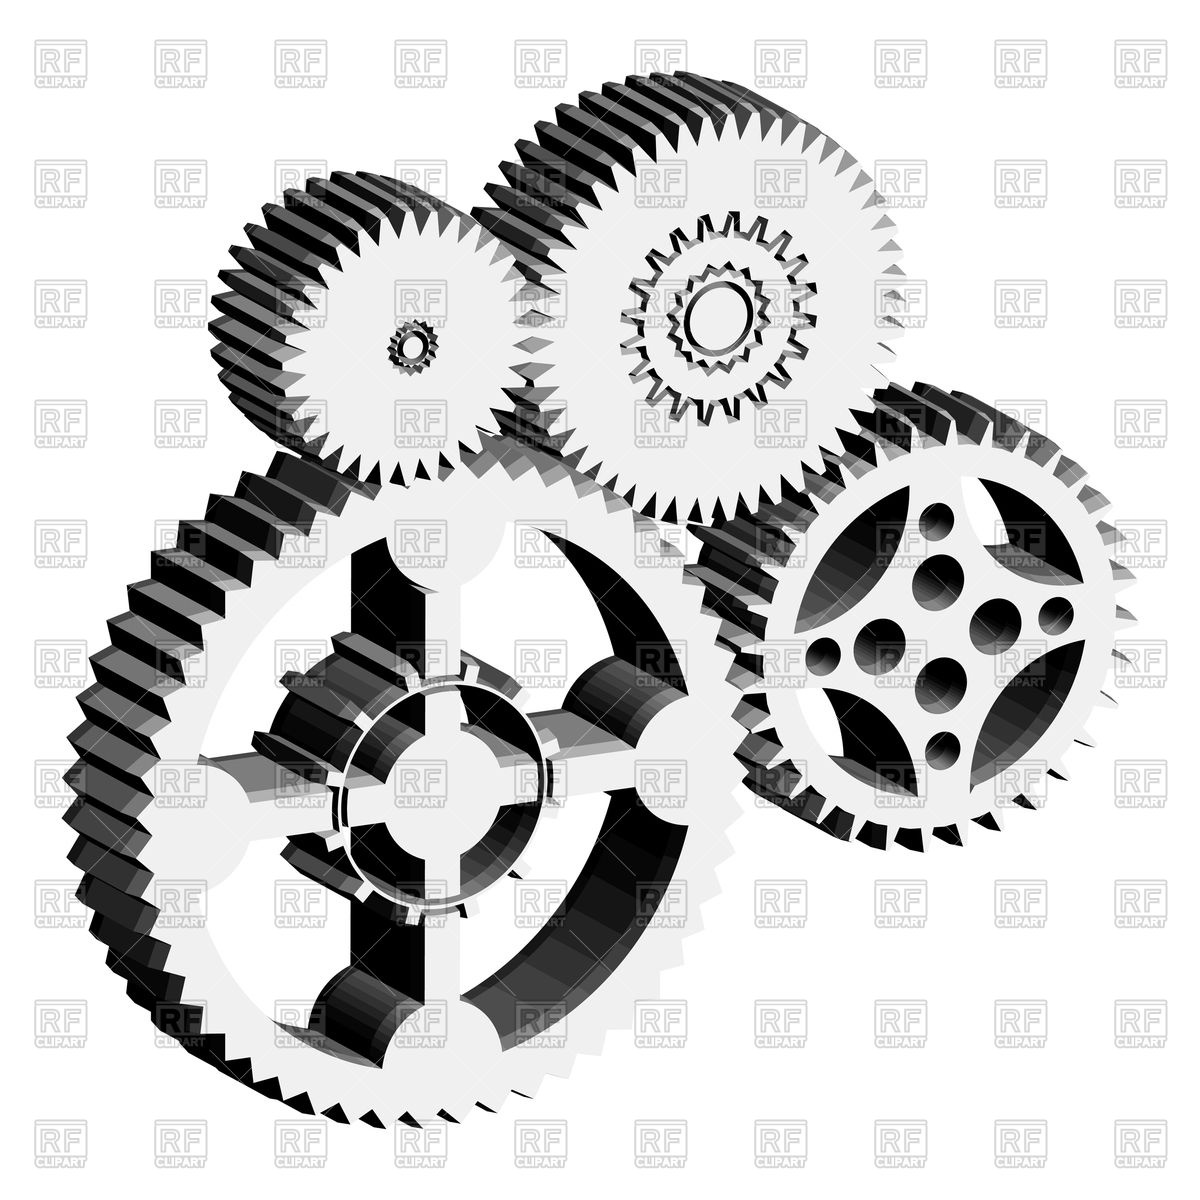 Metal gears and cogwheels Royalty Free Vector Clip Art